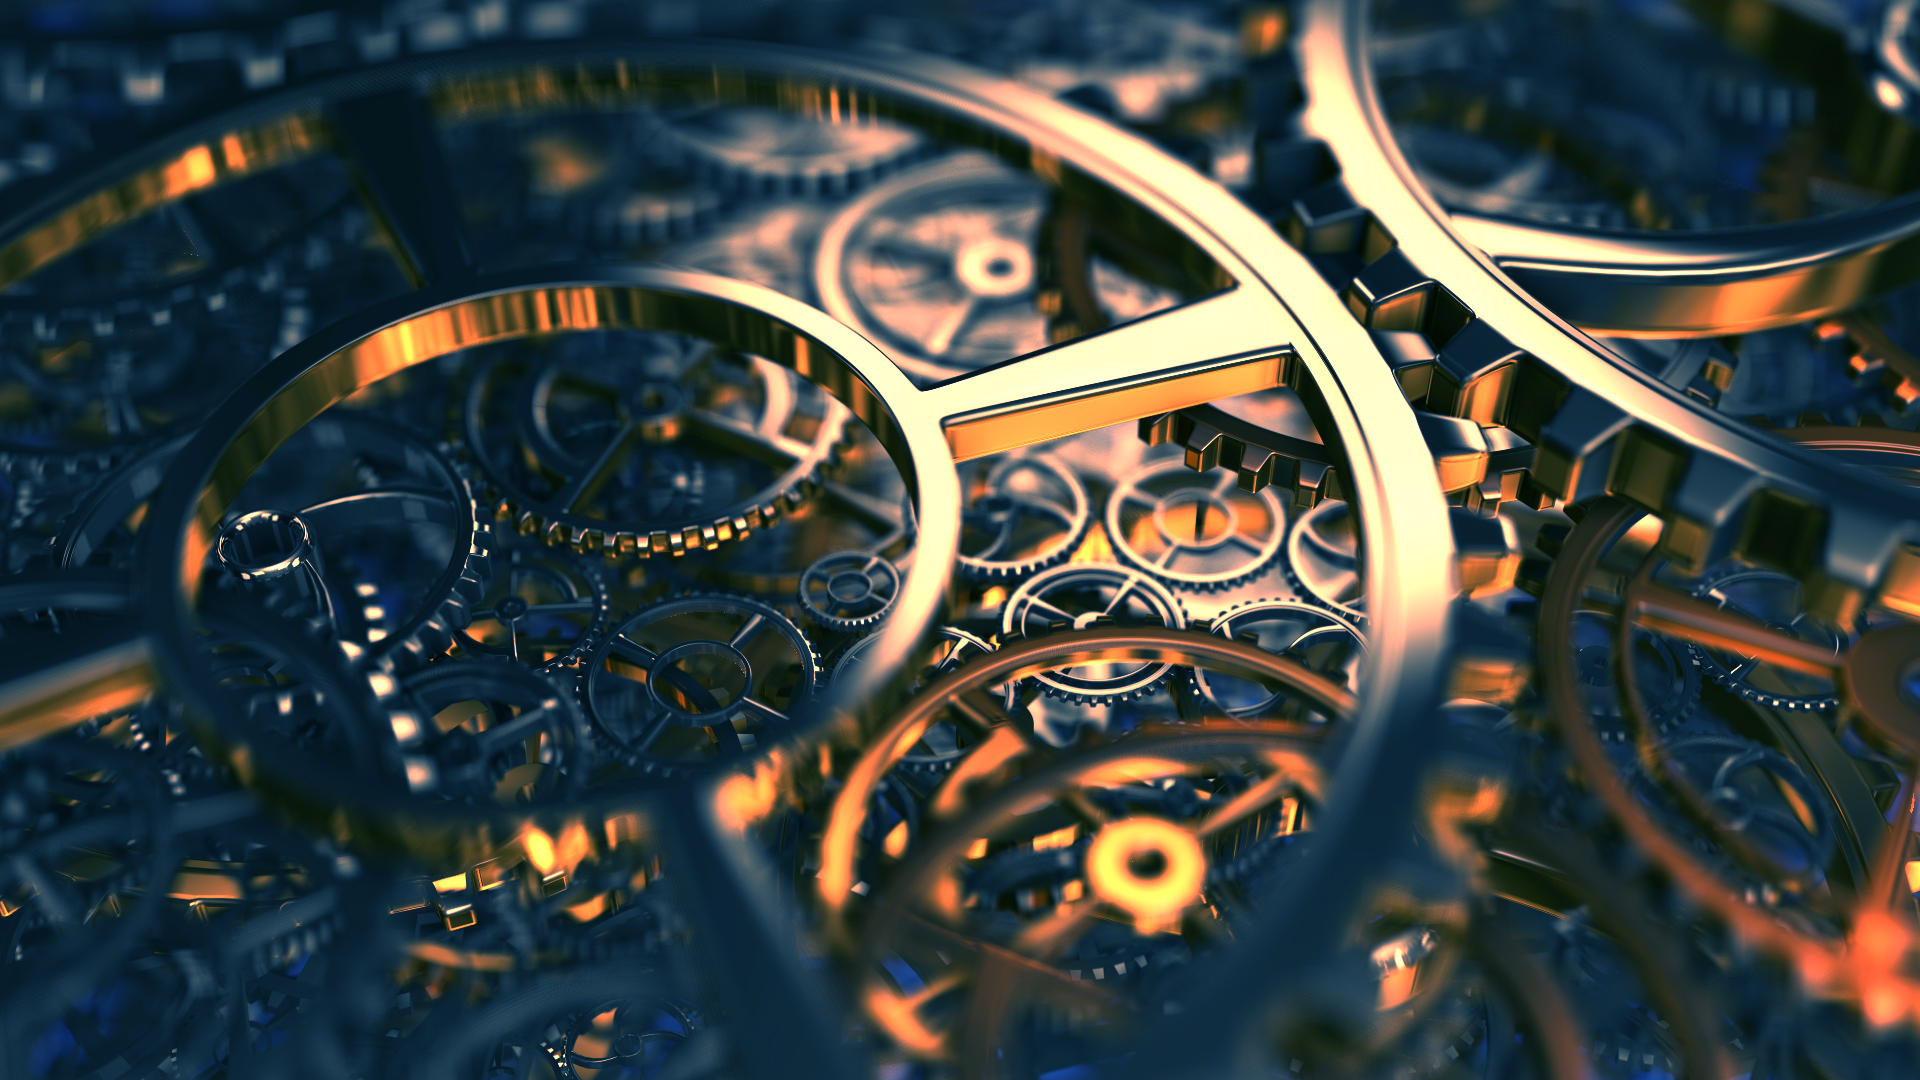 steampunk mechanical gears reflection wallpaper background 1920x1080